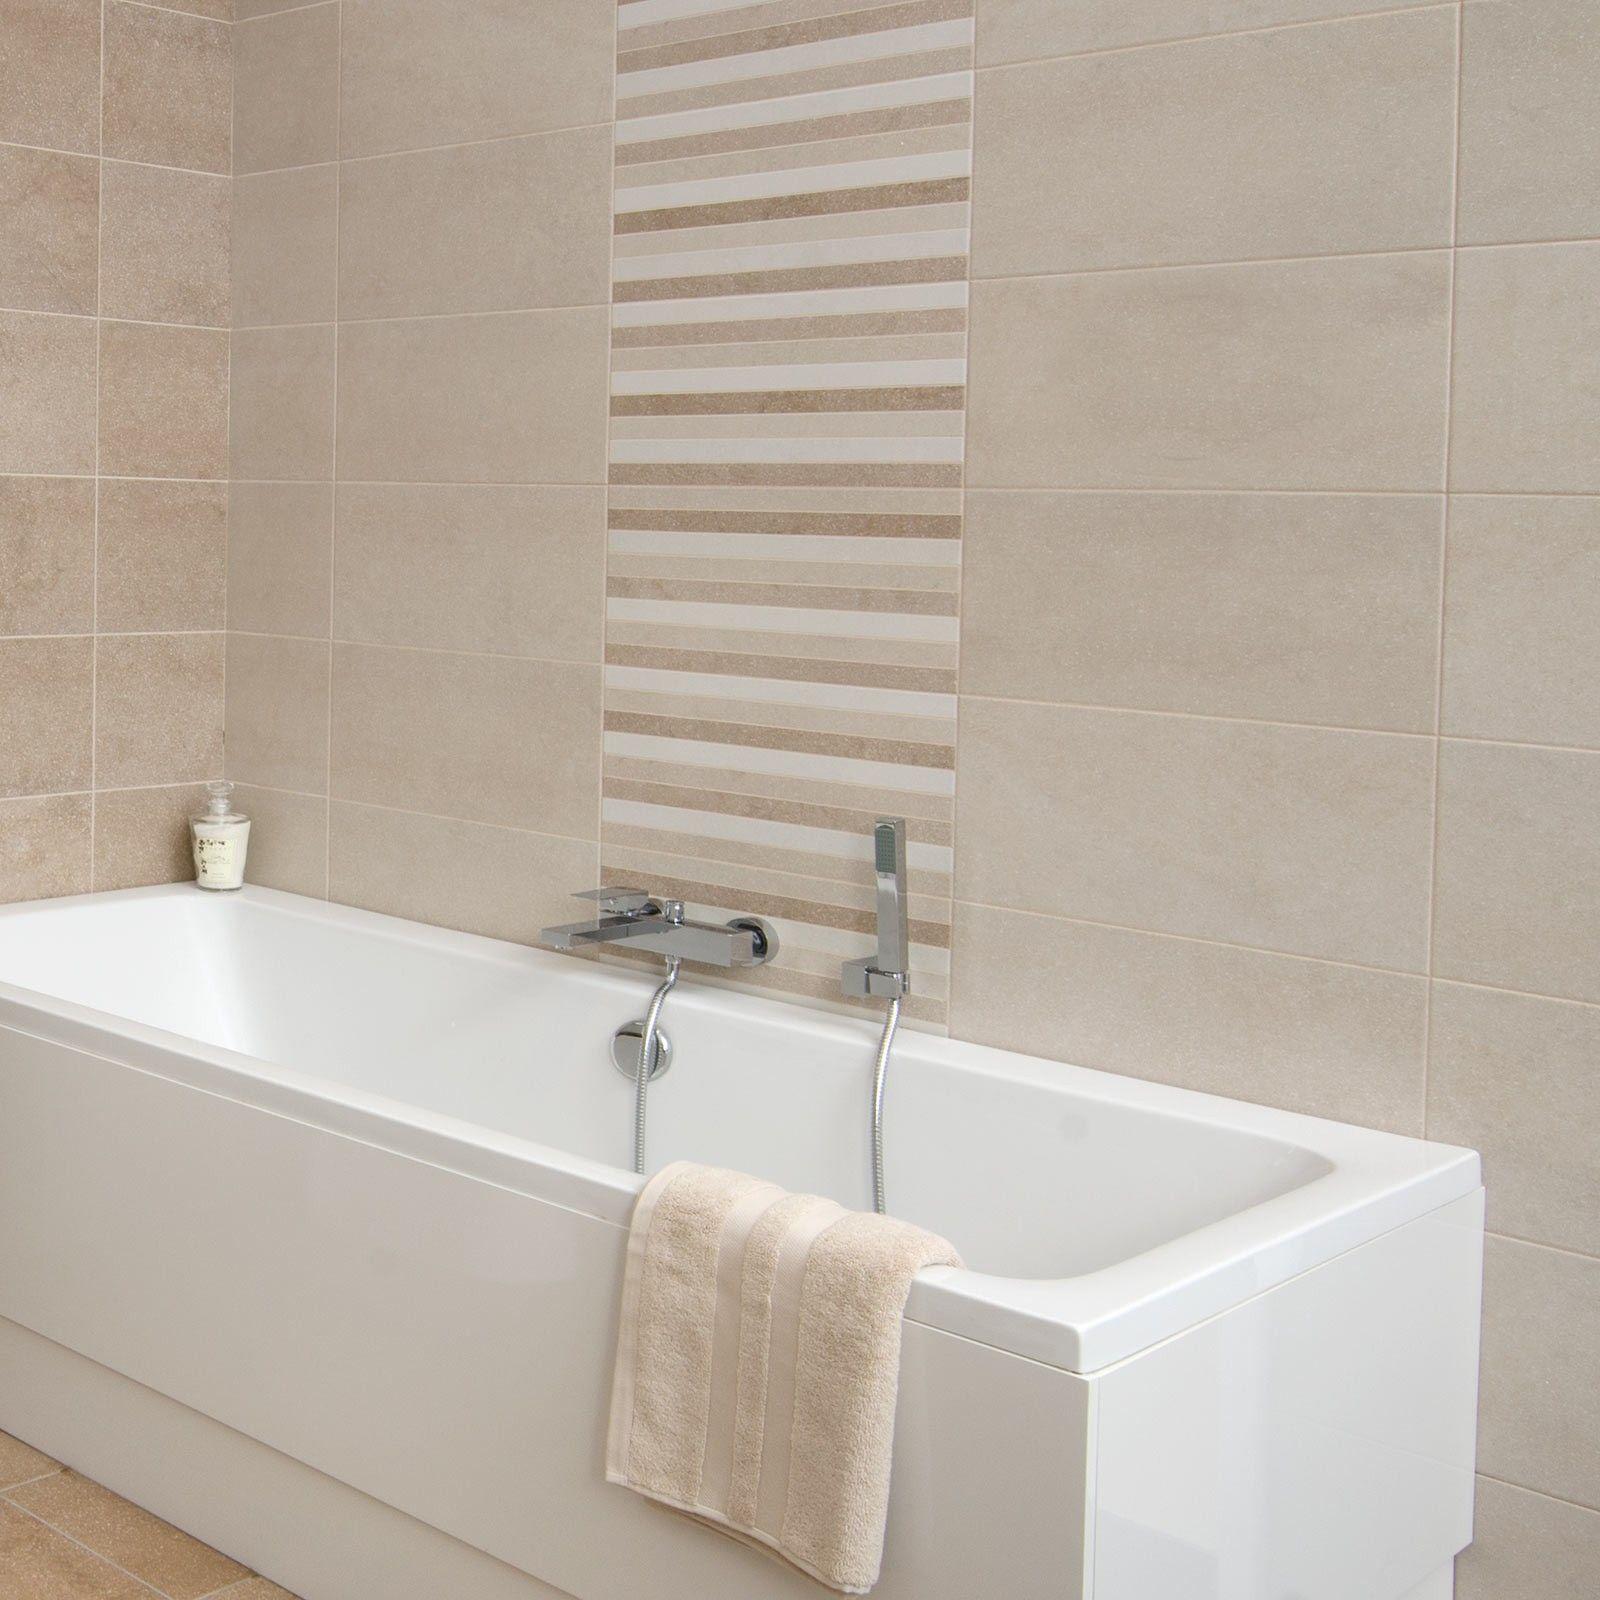 Square Sink Under Wall Mirror Mounted Beige Bathroom Floor Tiles ...